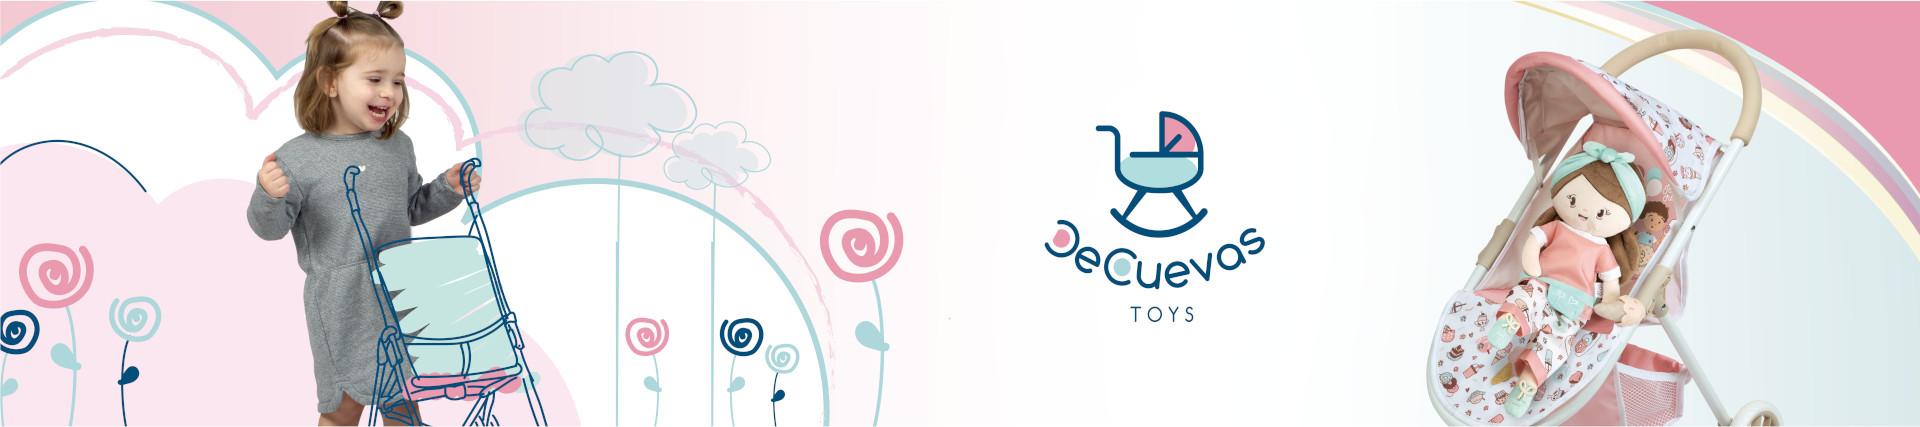 Puppenstühle | DeCuevas Toys